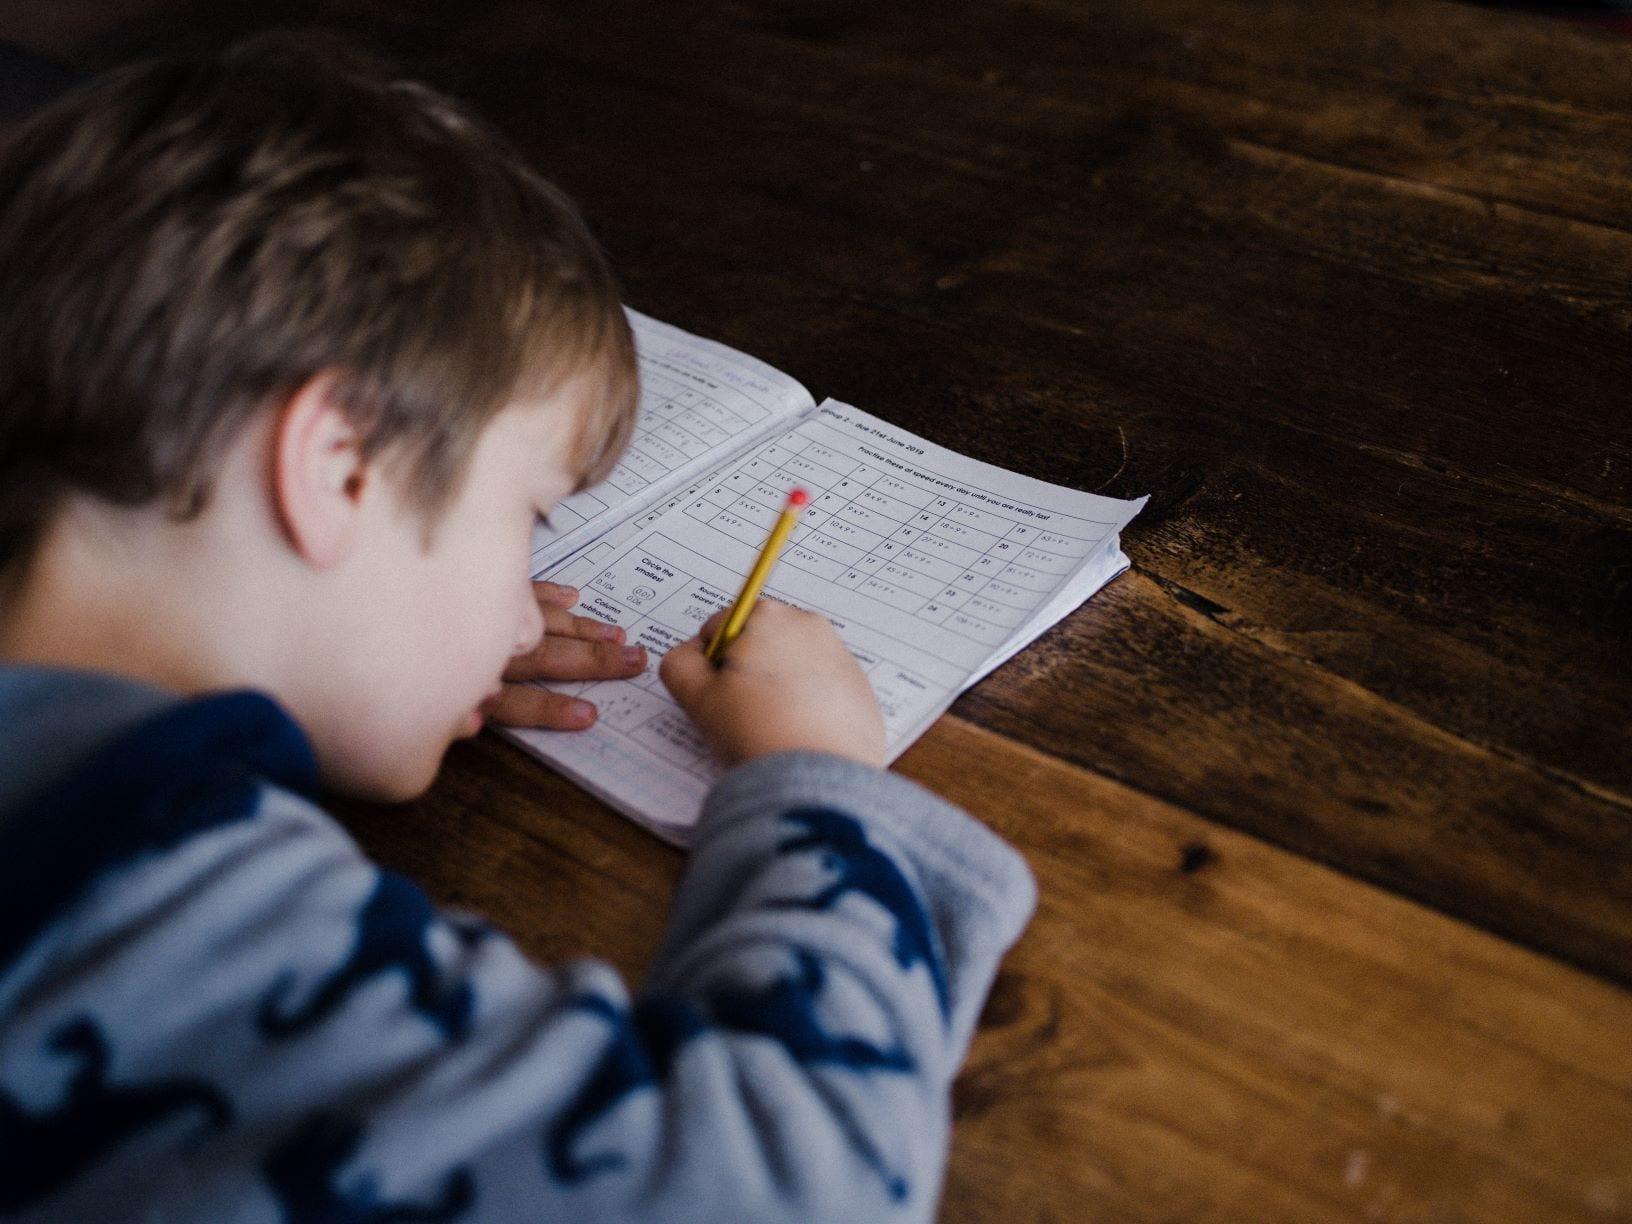 responsável (in)sucesso escolar aluno?